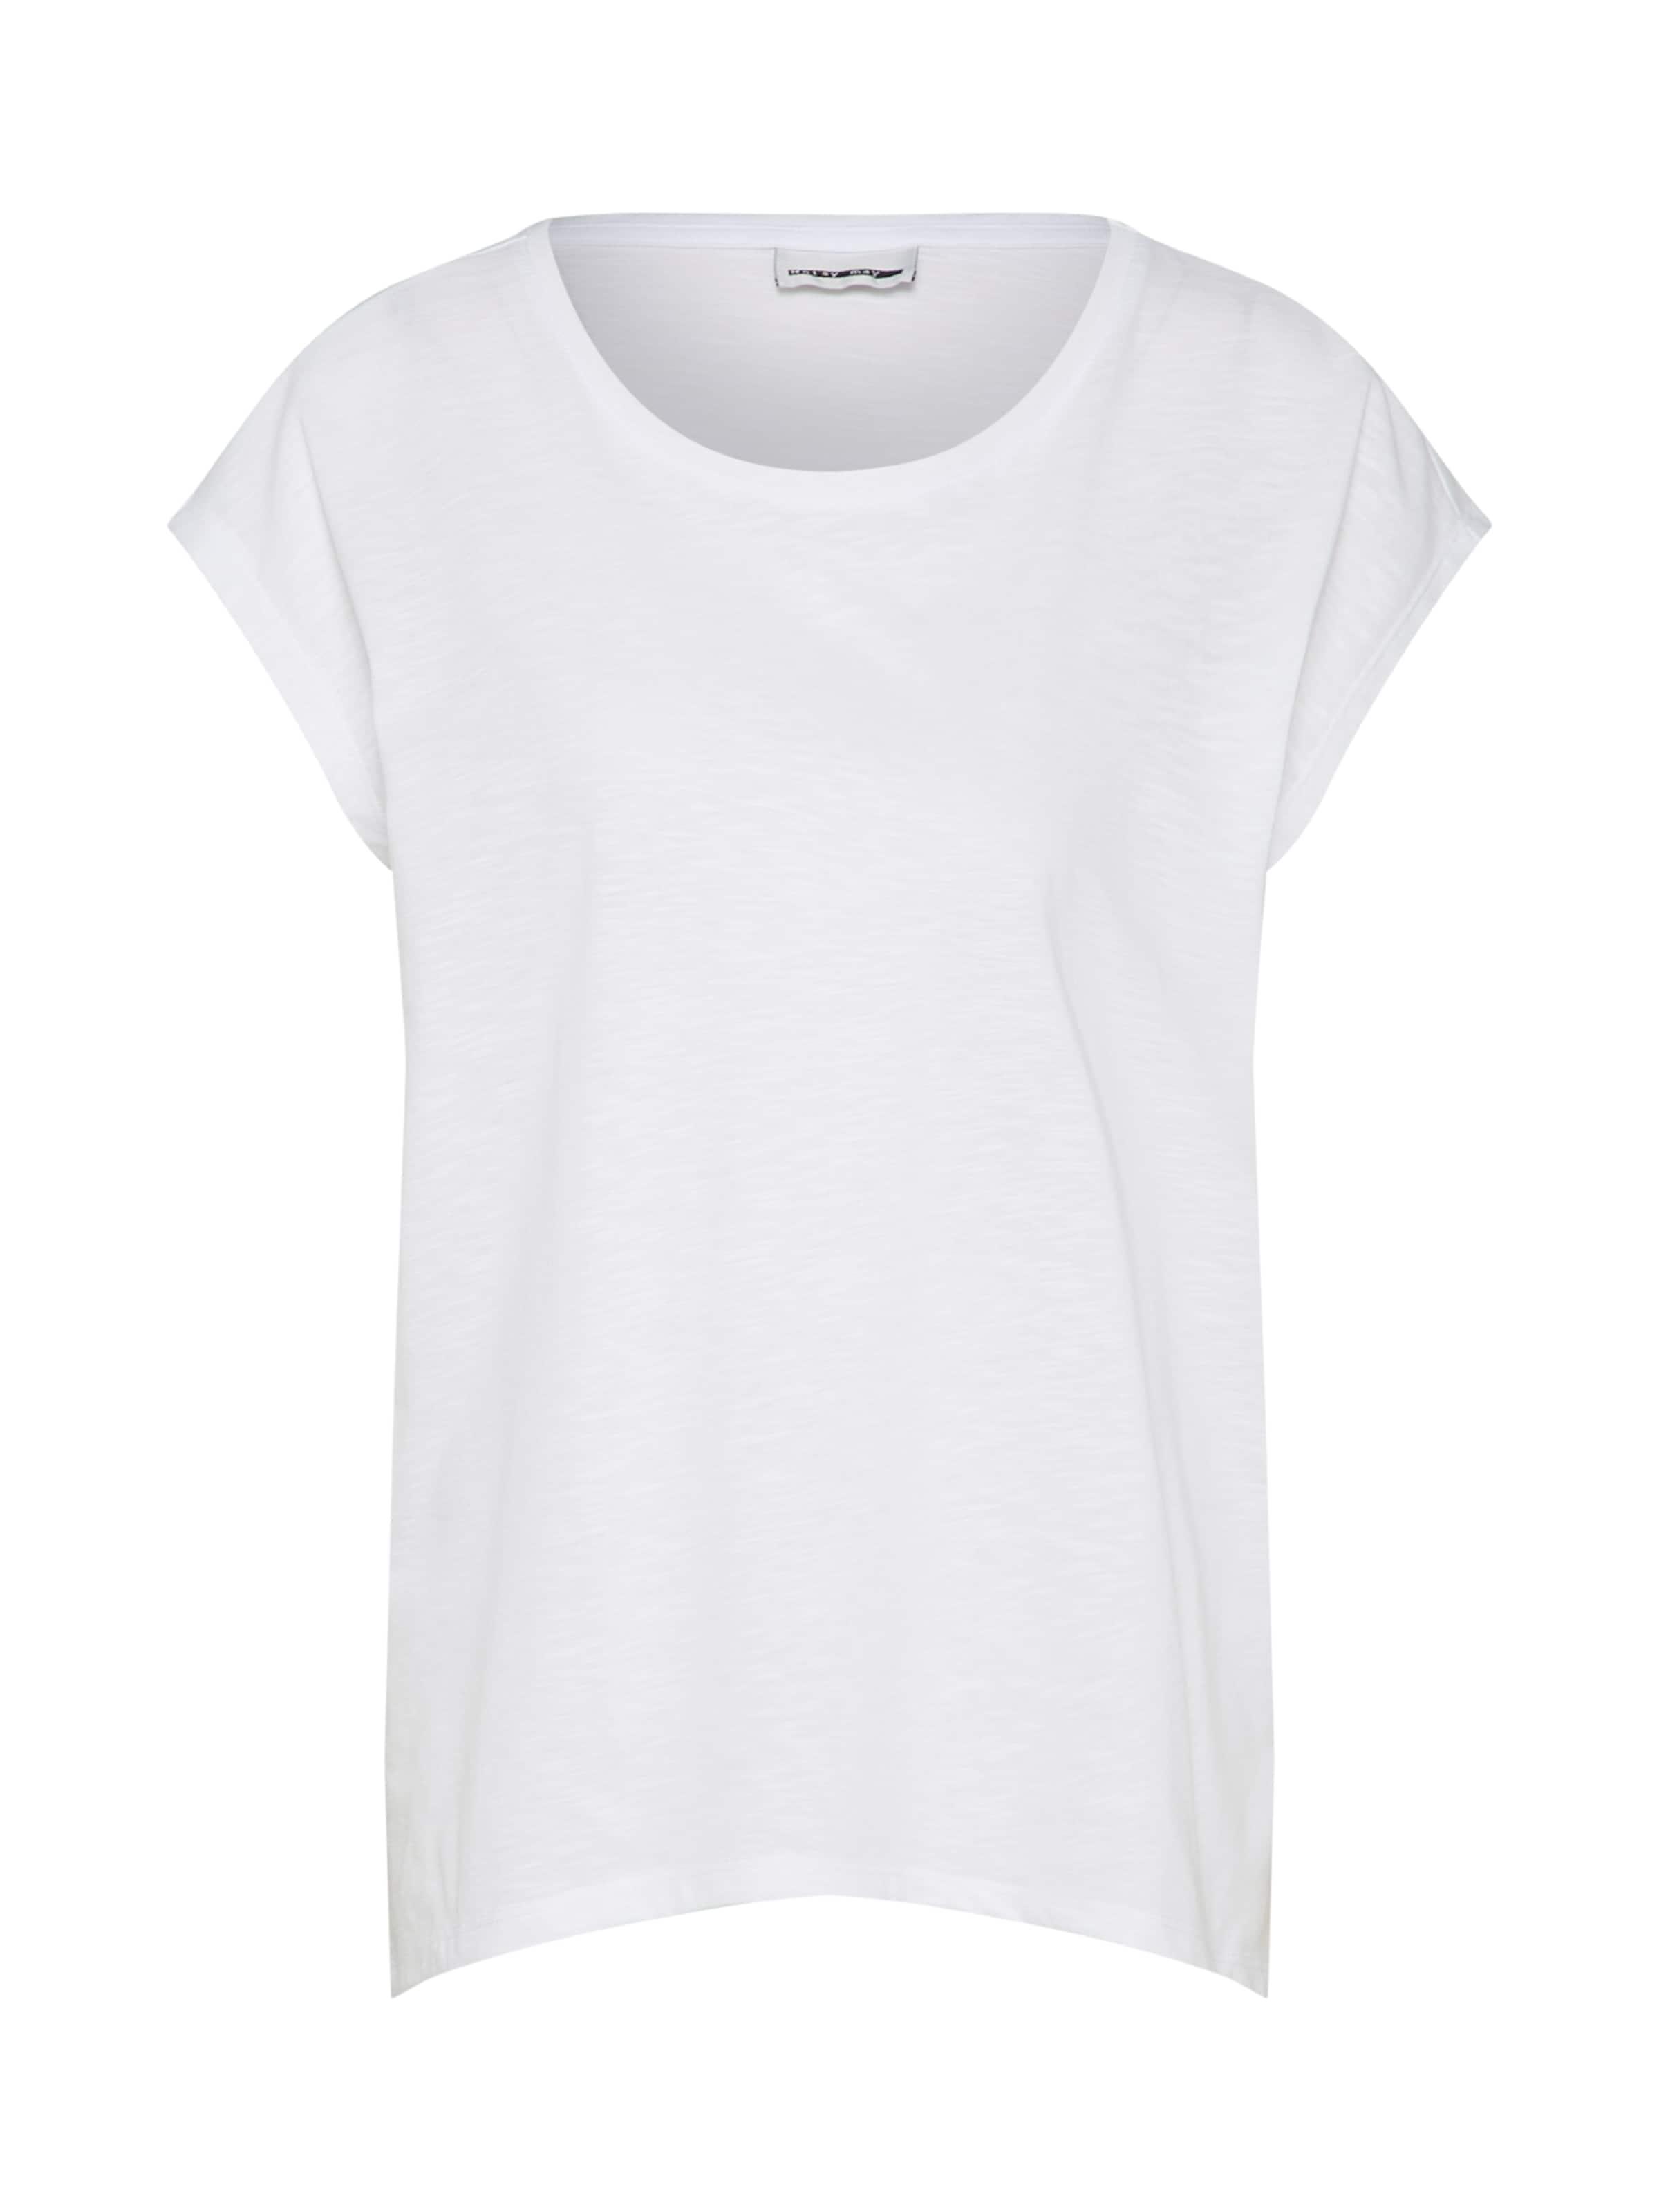 Oversized 'mathilde' Wit Shirt In Noisy May qGVUpSzM